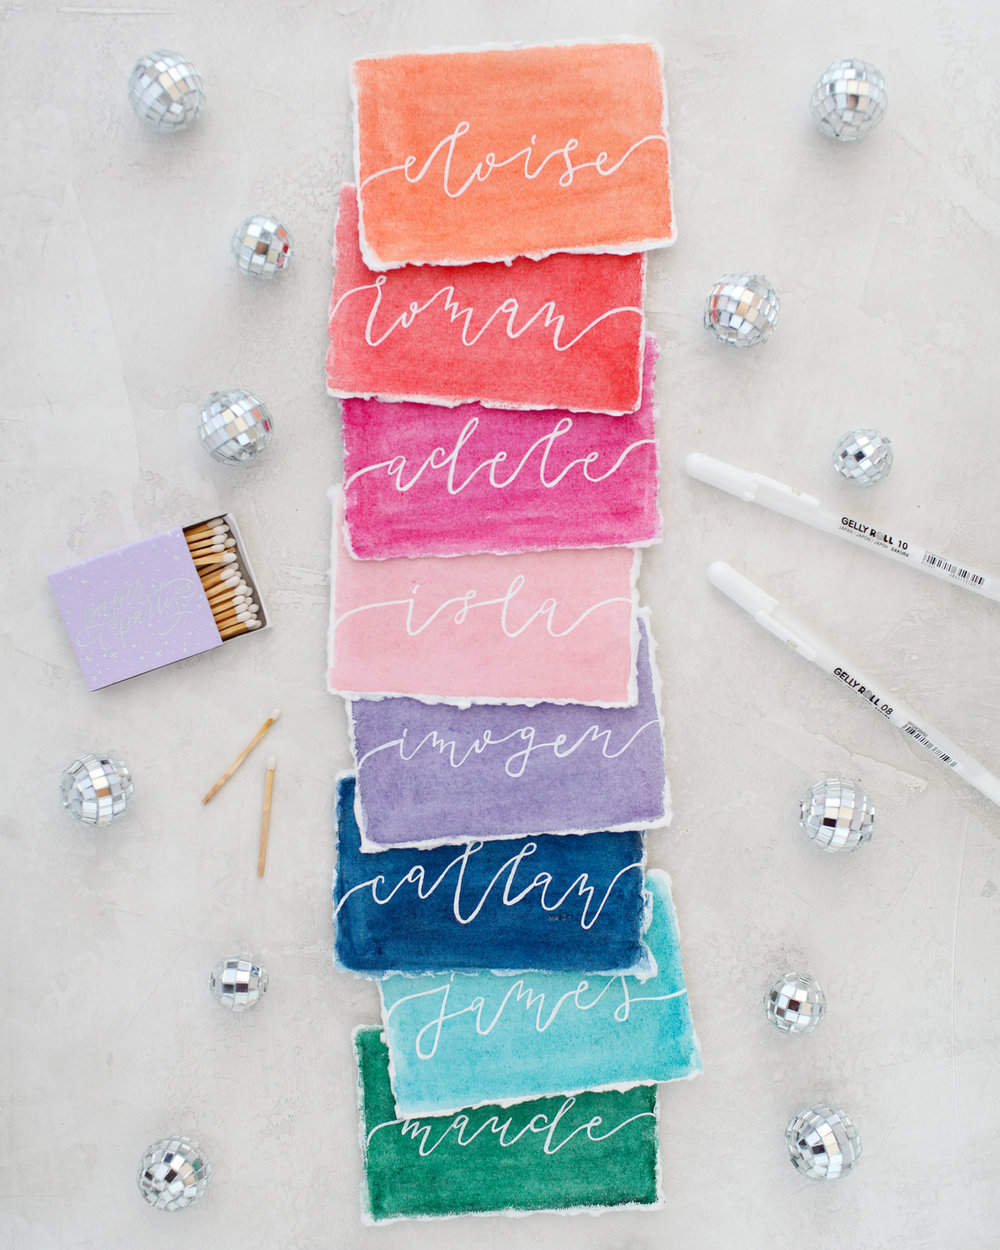 Rainbow-Watercolor-Wedding-Stationery-Inspiration-1.jpg